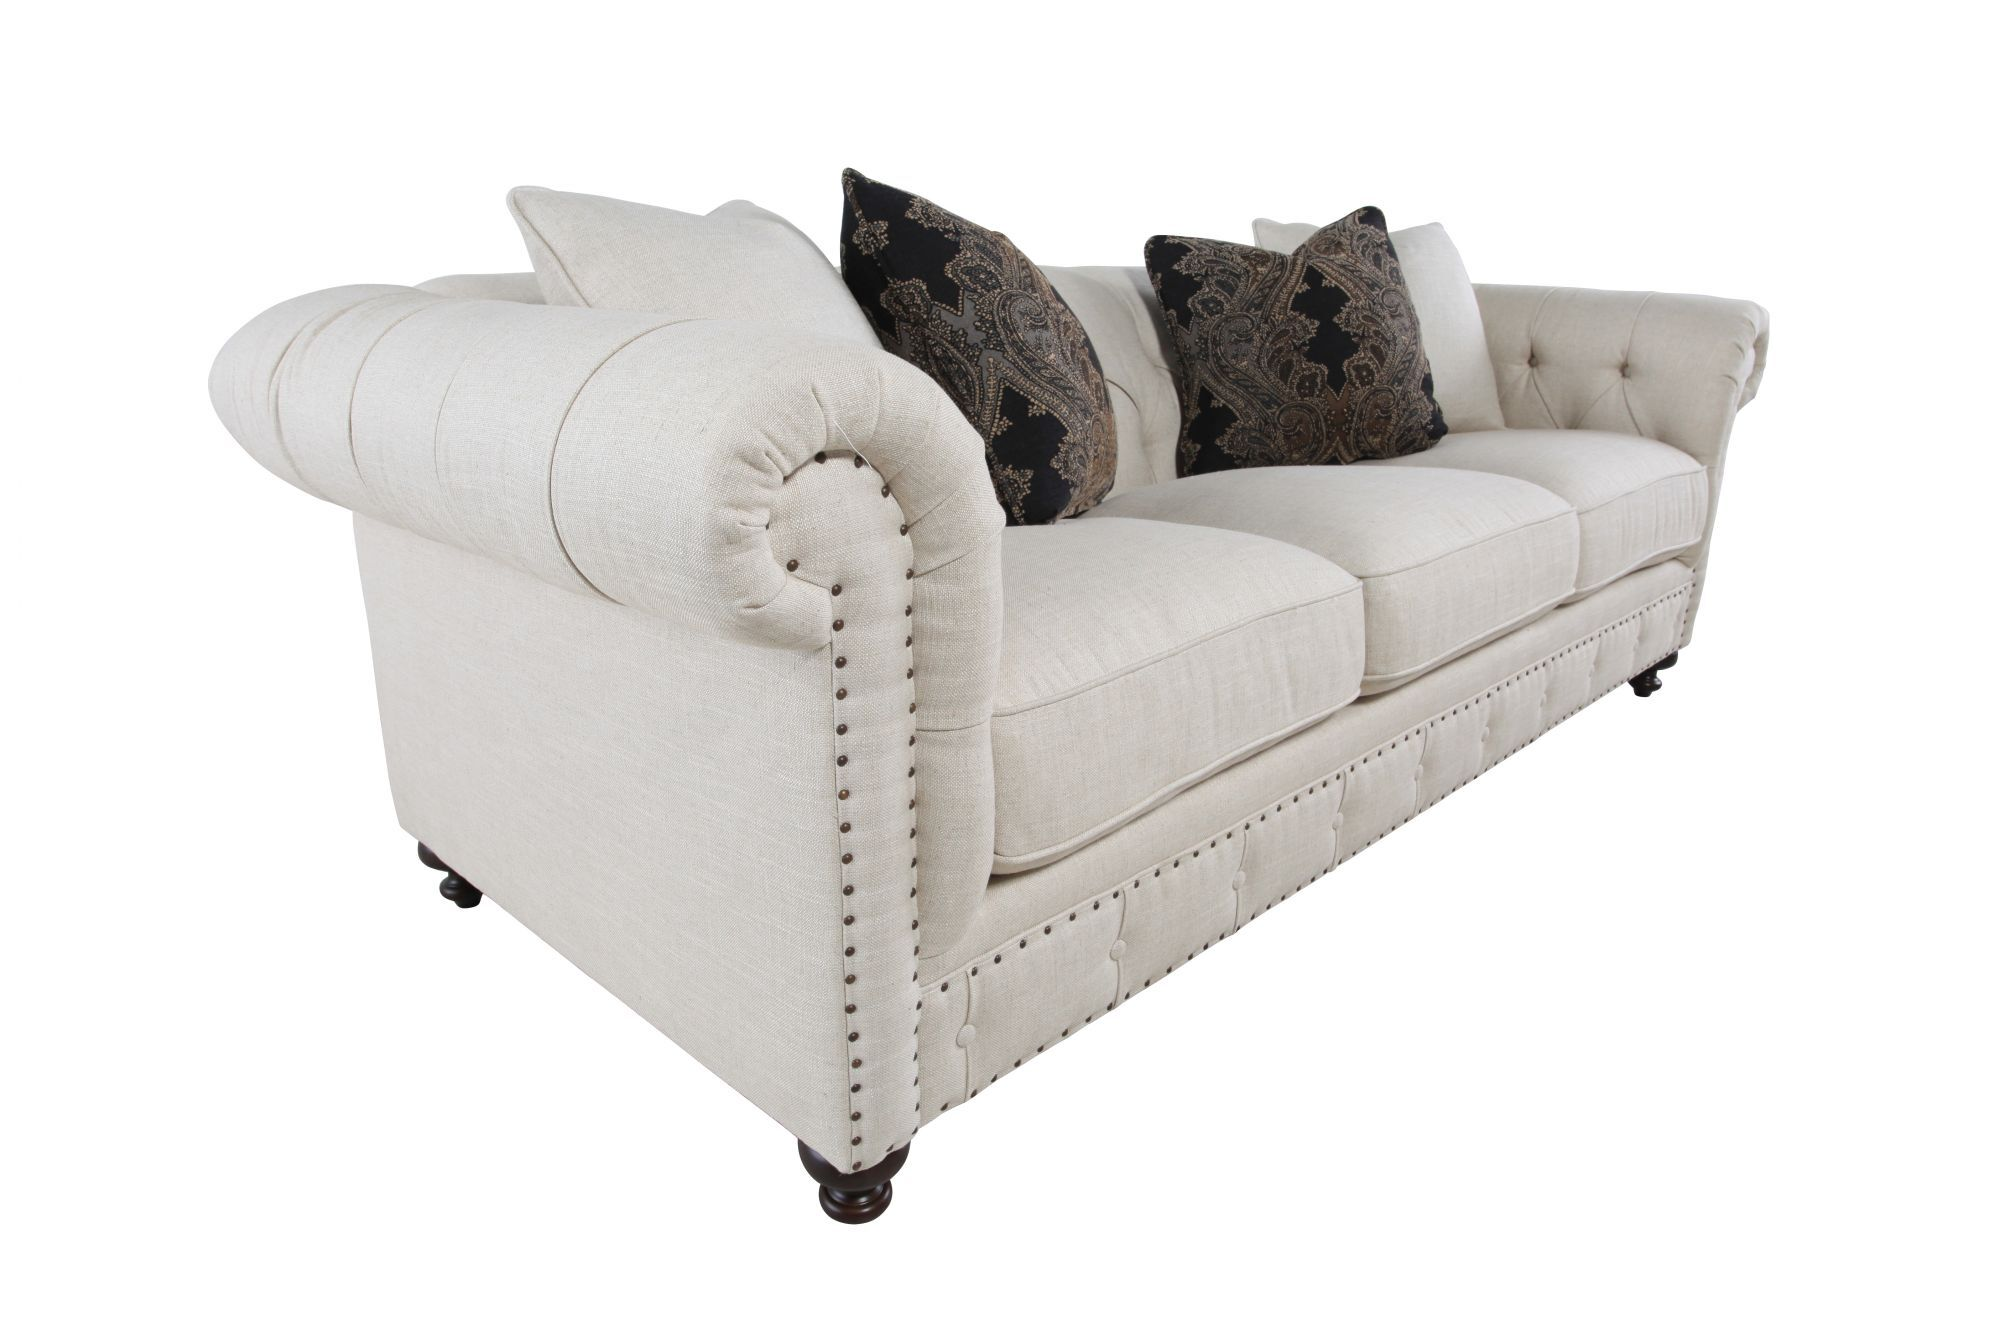 bernhardt riviera large sofa pics of decorated tables european classic button tufted in cream mathis